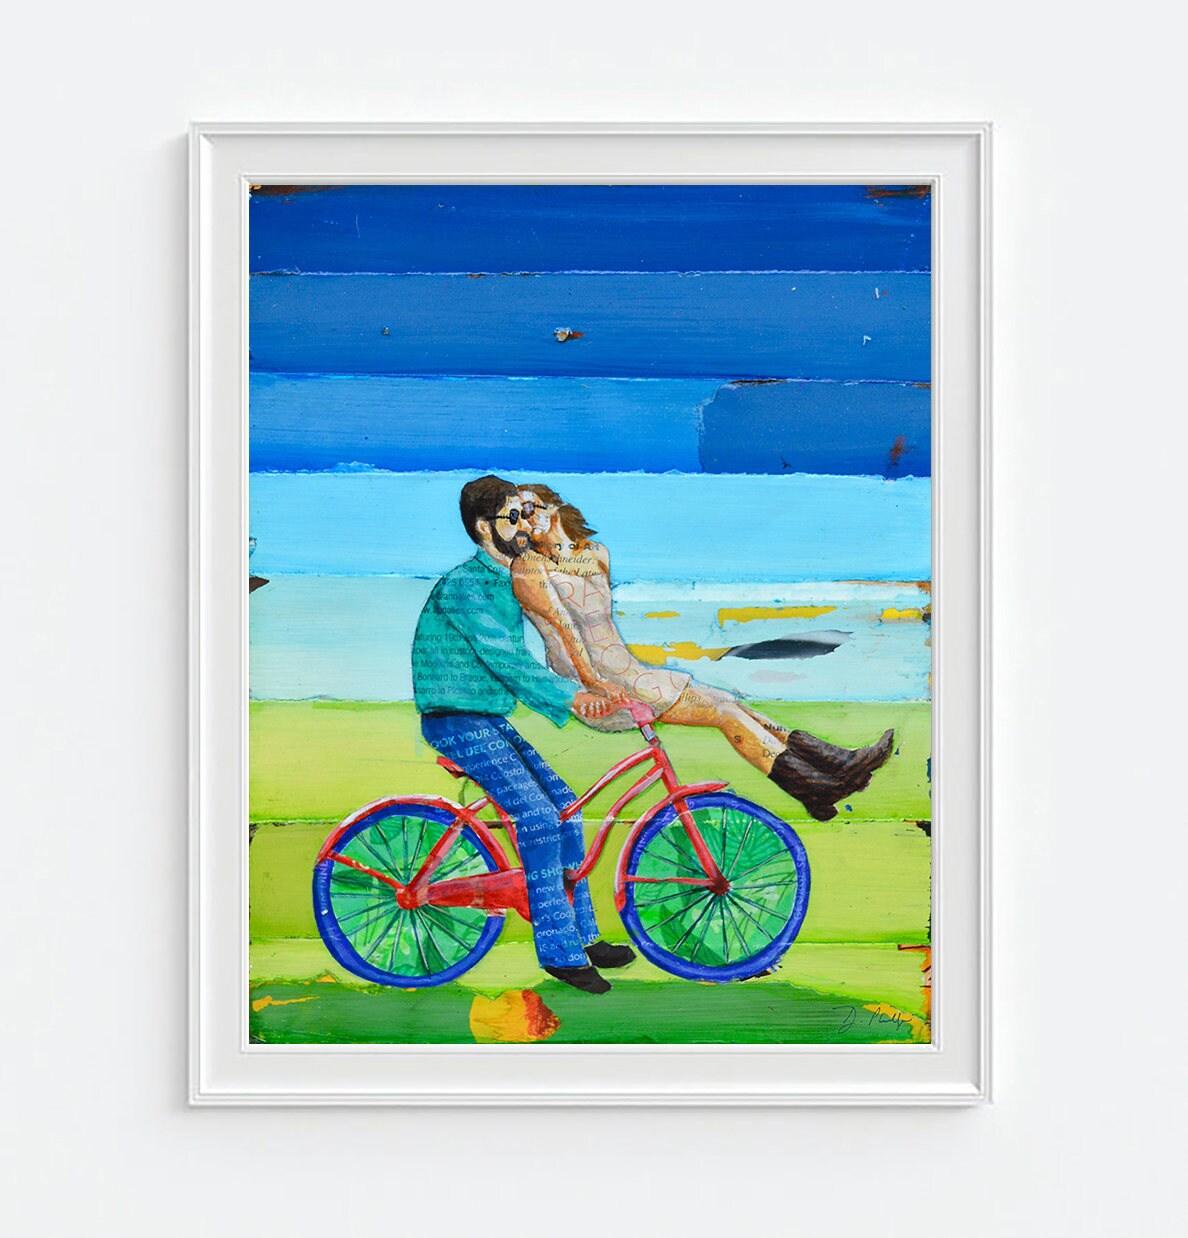 Fresh Handlebars -Danny Phillips ART PRINT or CANVAS Bicycle biking  GB56